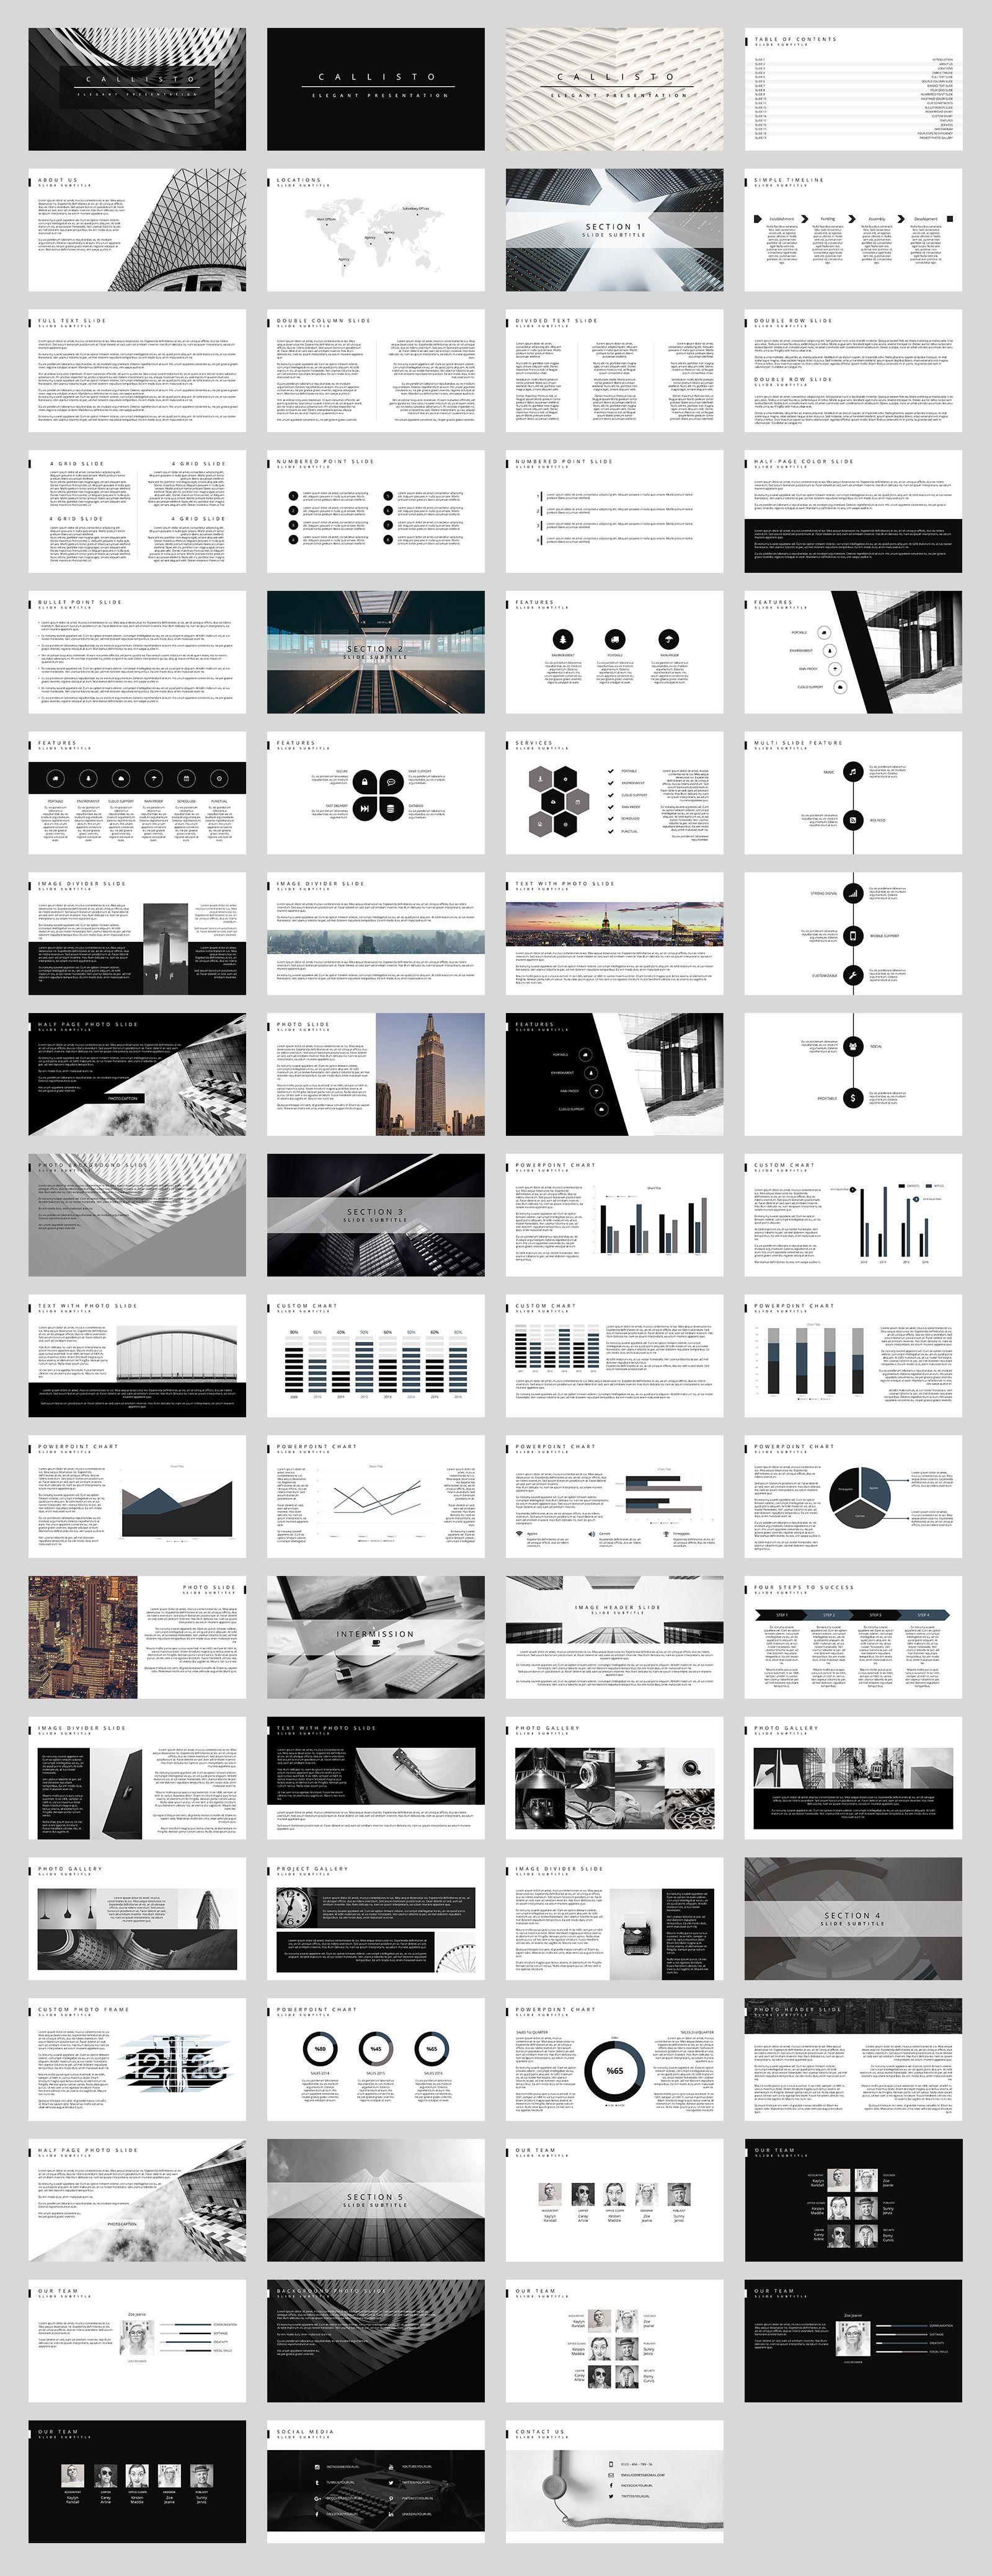 callisto powerpoint template - presentations